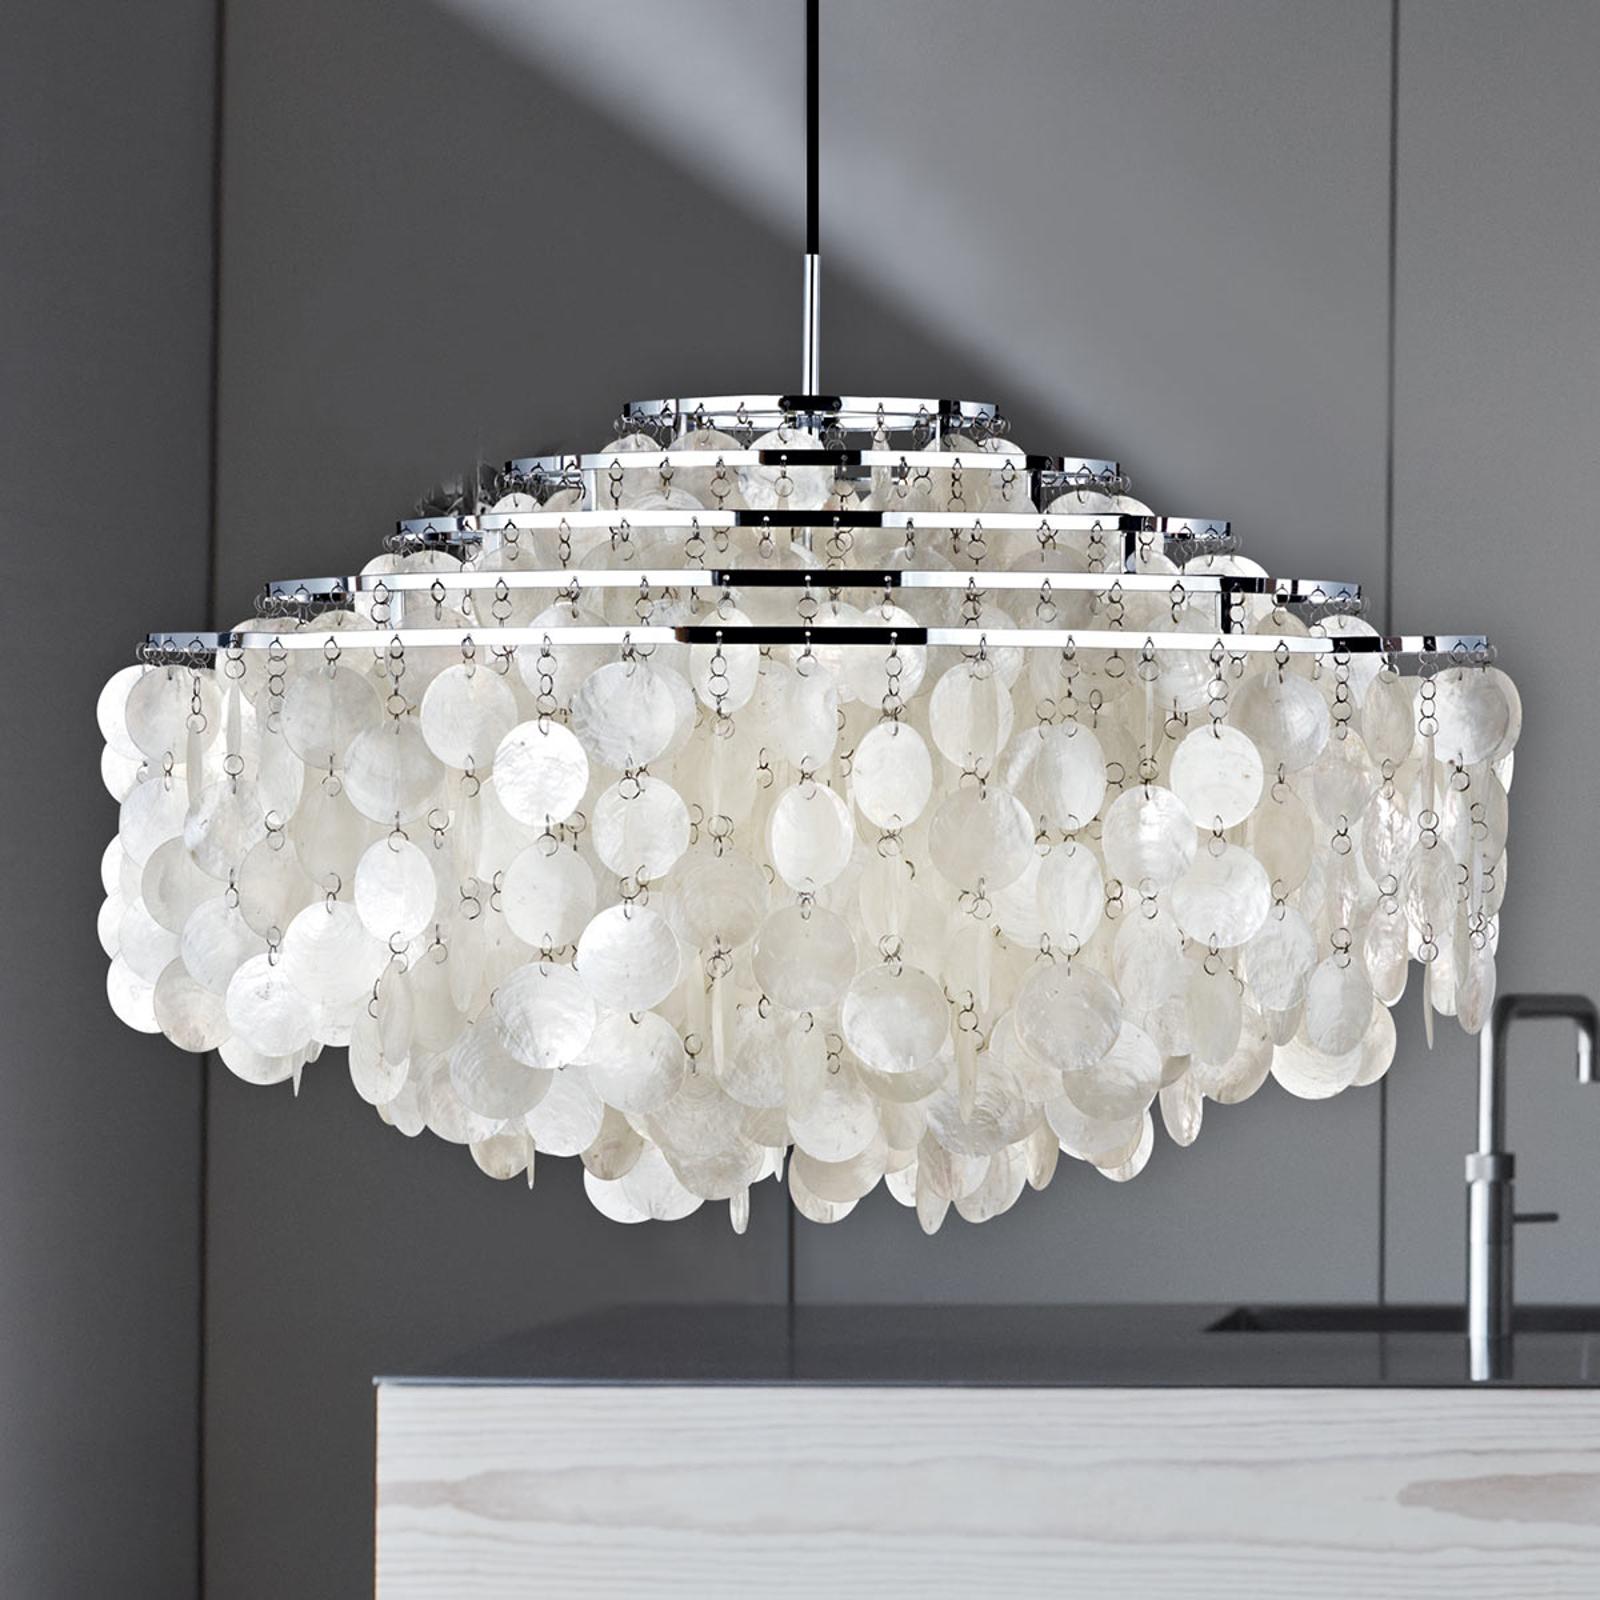 VERPAN Fun 11DM - lampa wisząca z płytek muszli